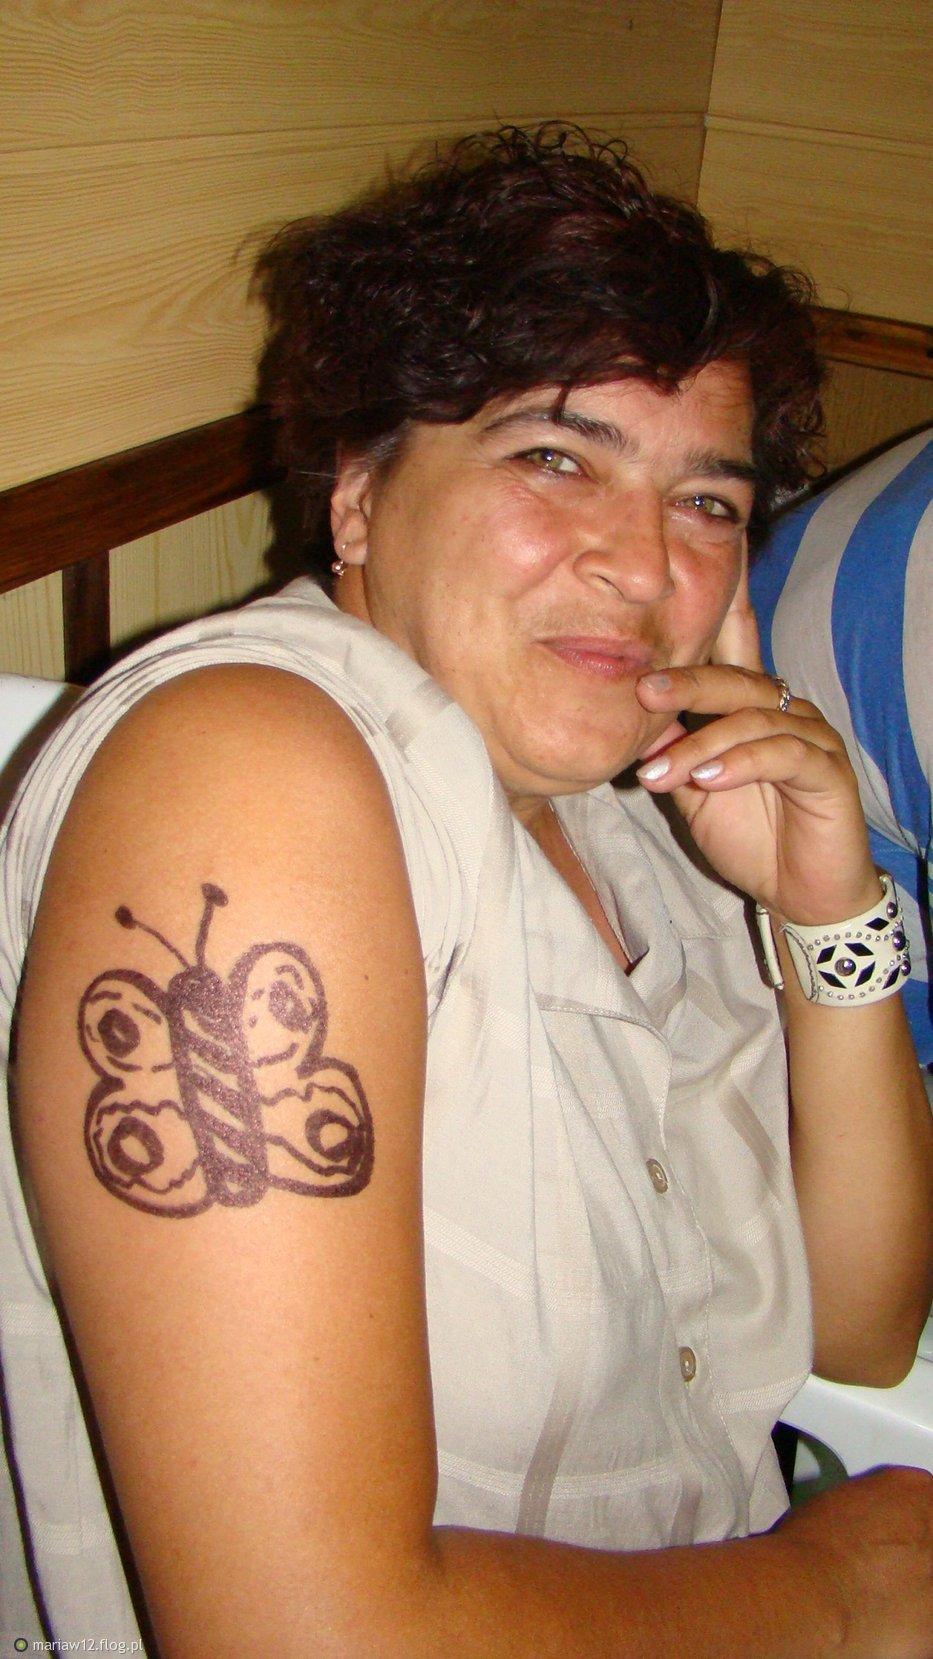 Tatuaze Zdjecia